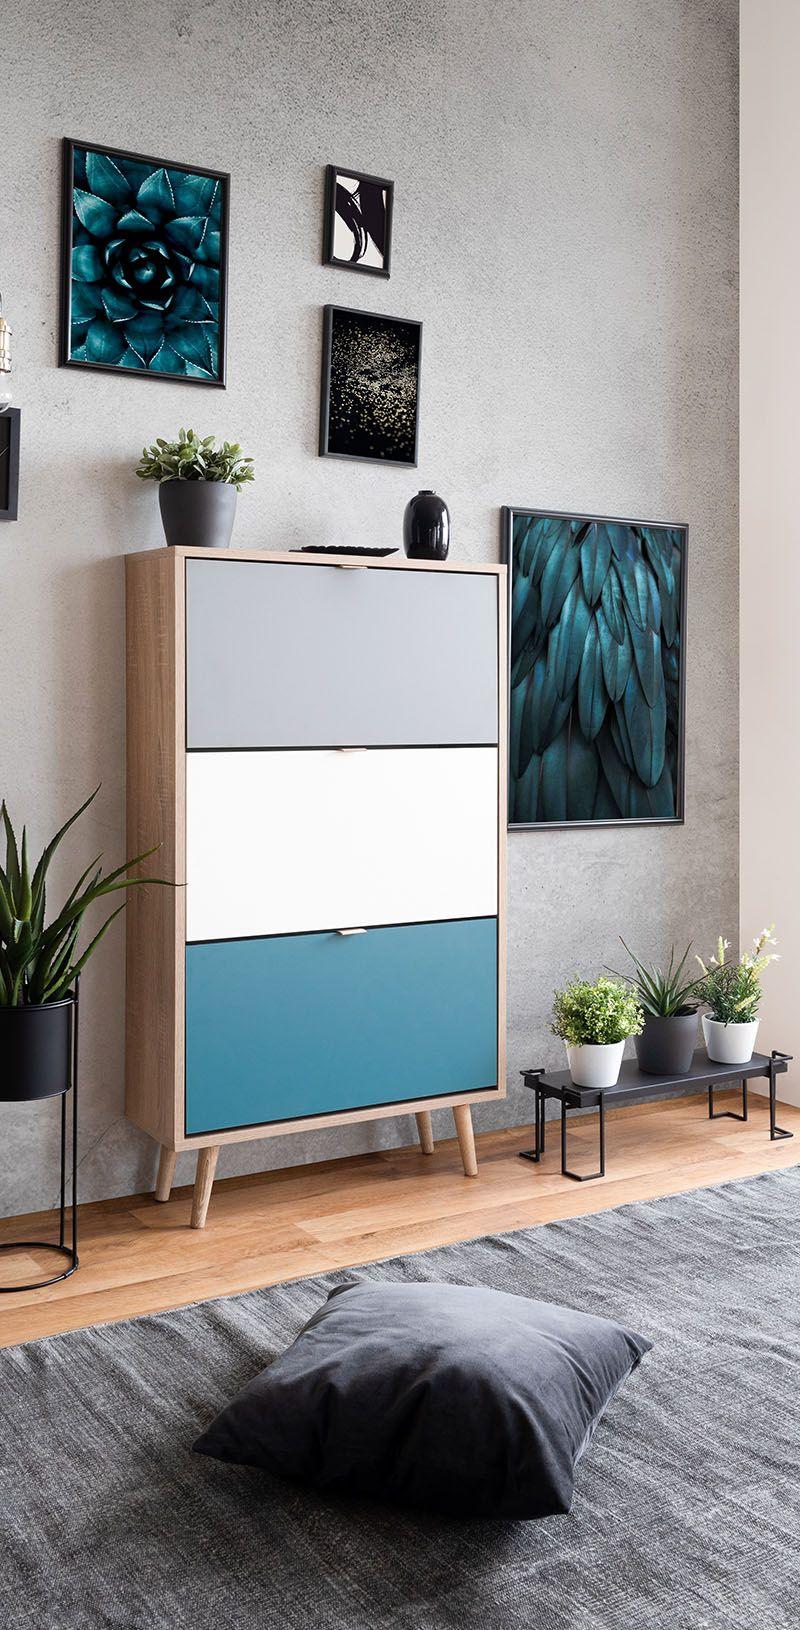 Schuhkipper Online Kaufen Xxxlutz Интерьер Мебель Идеи декора для дома